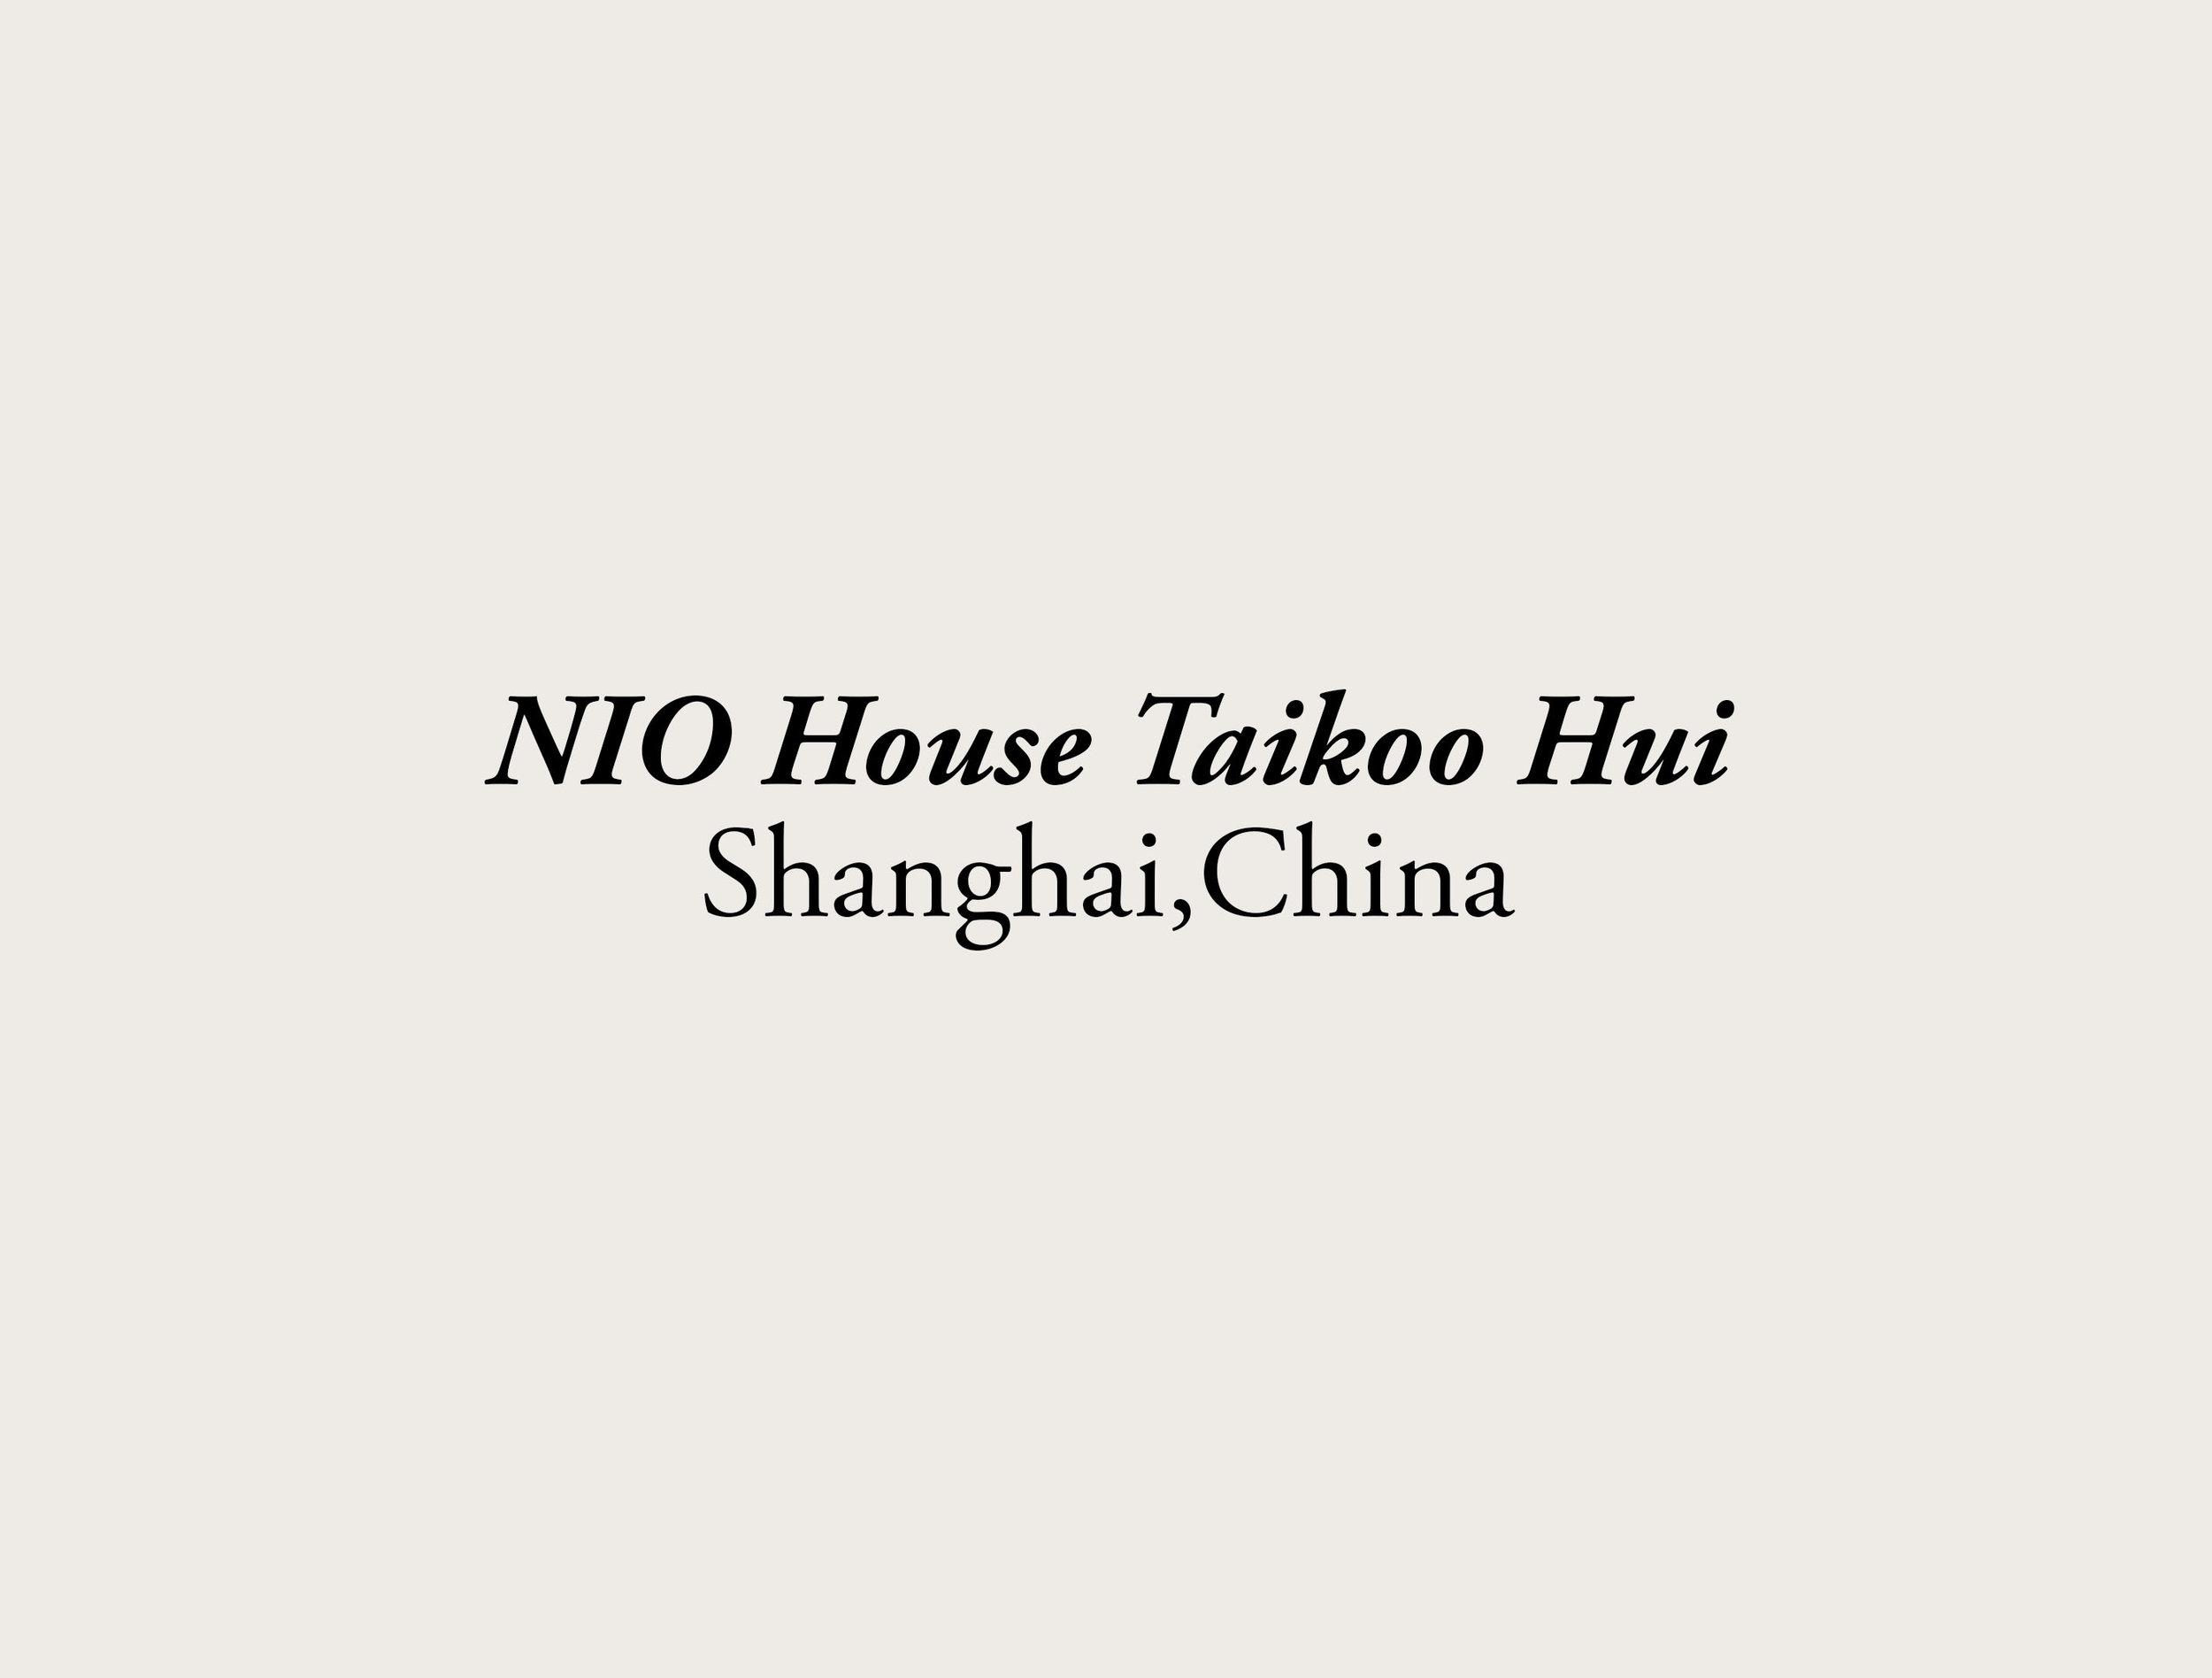 raams-architecture-design-studio-nio-house-electric-car-showroom-retail-shanghai-china-01.jpg